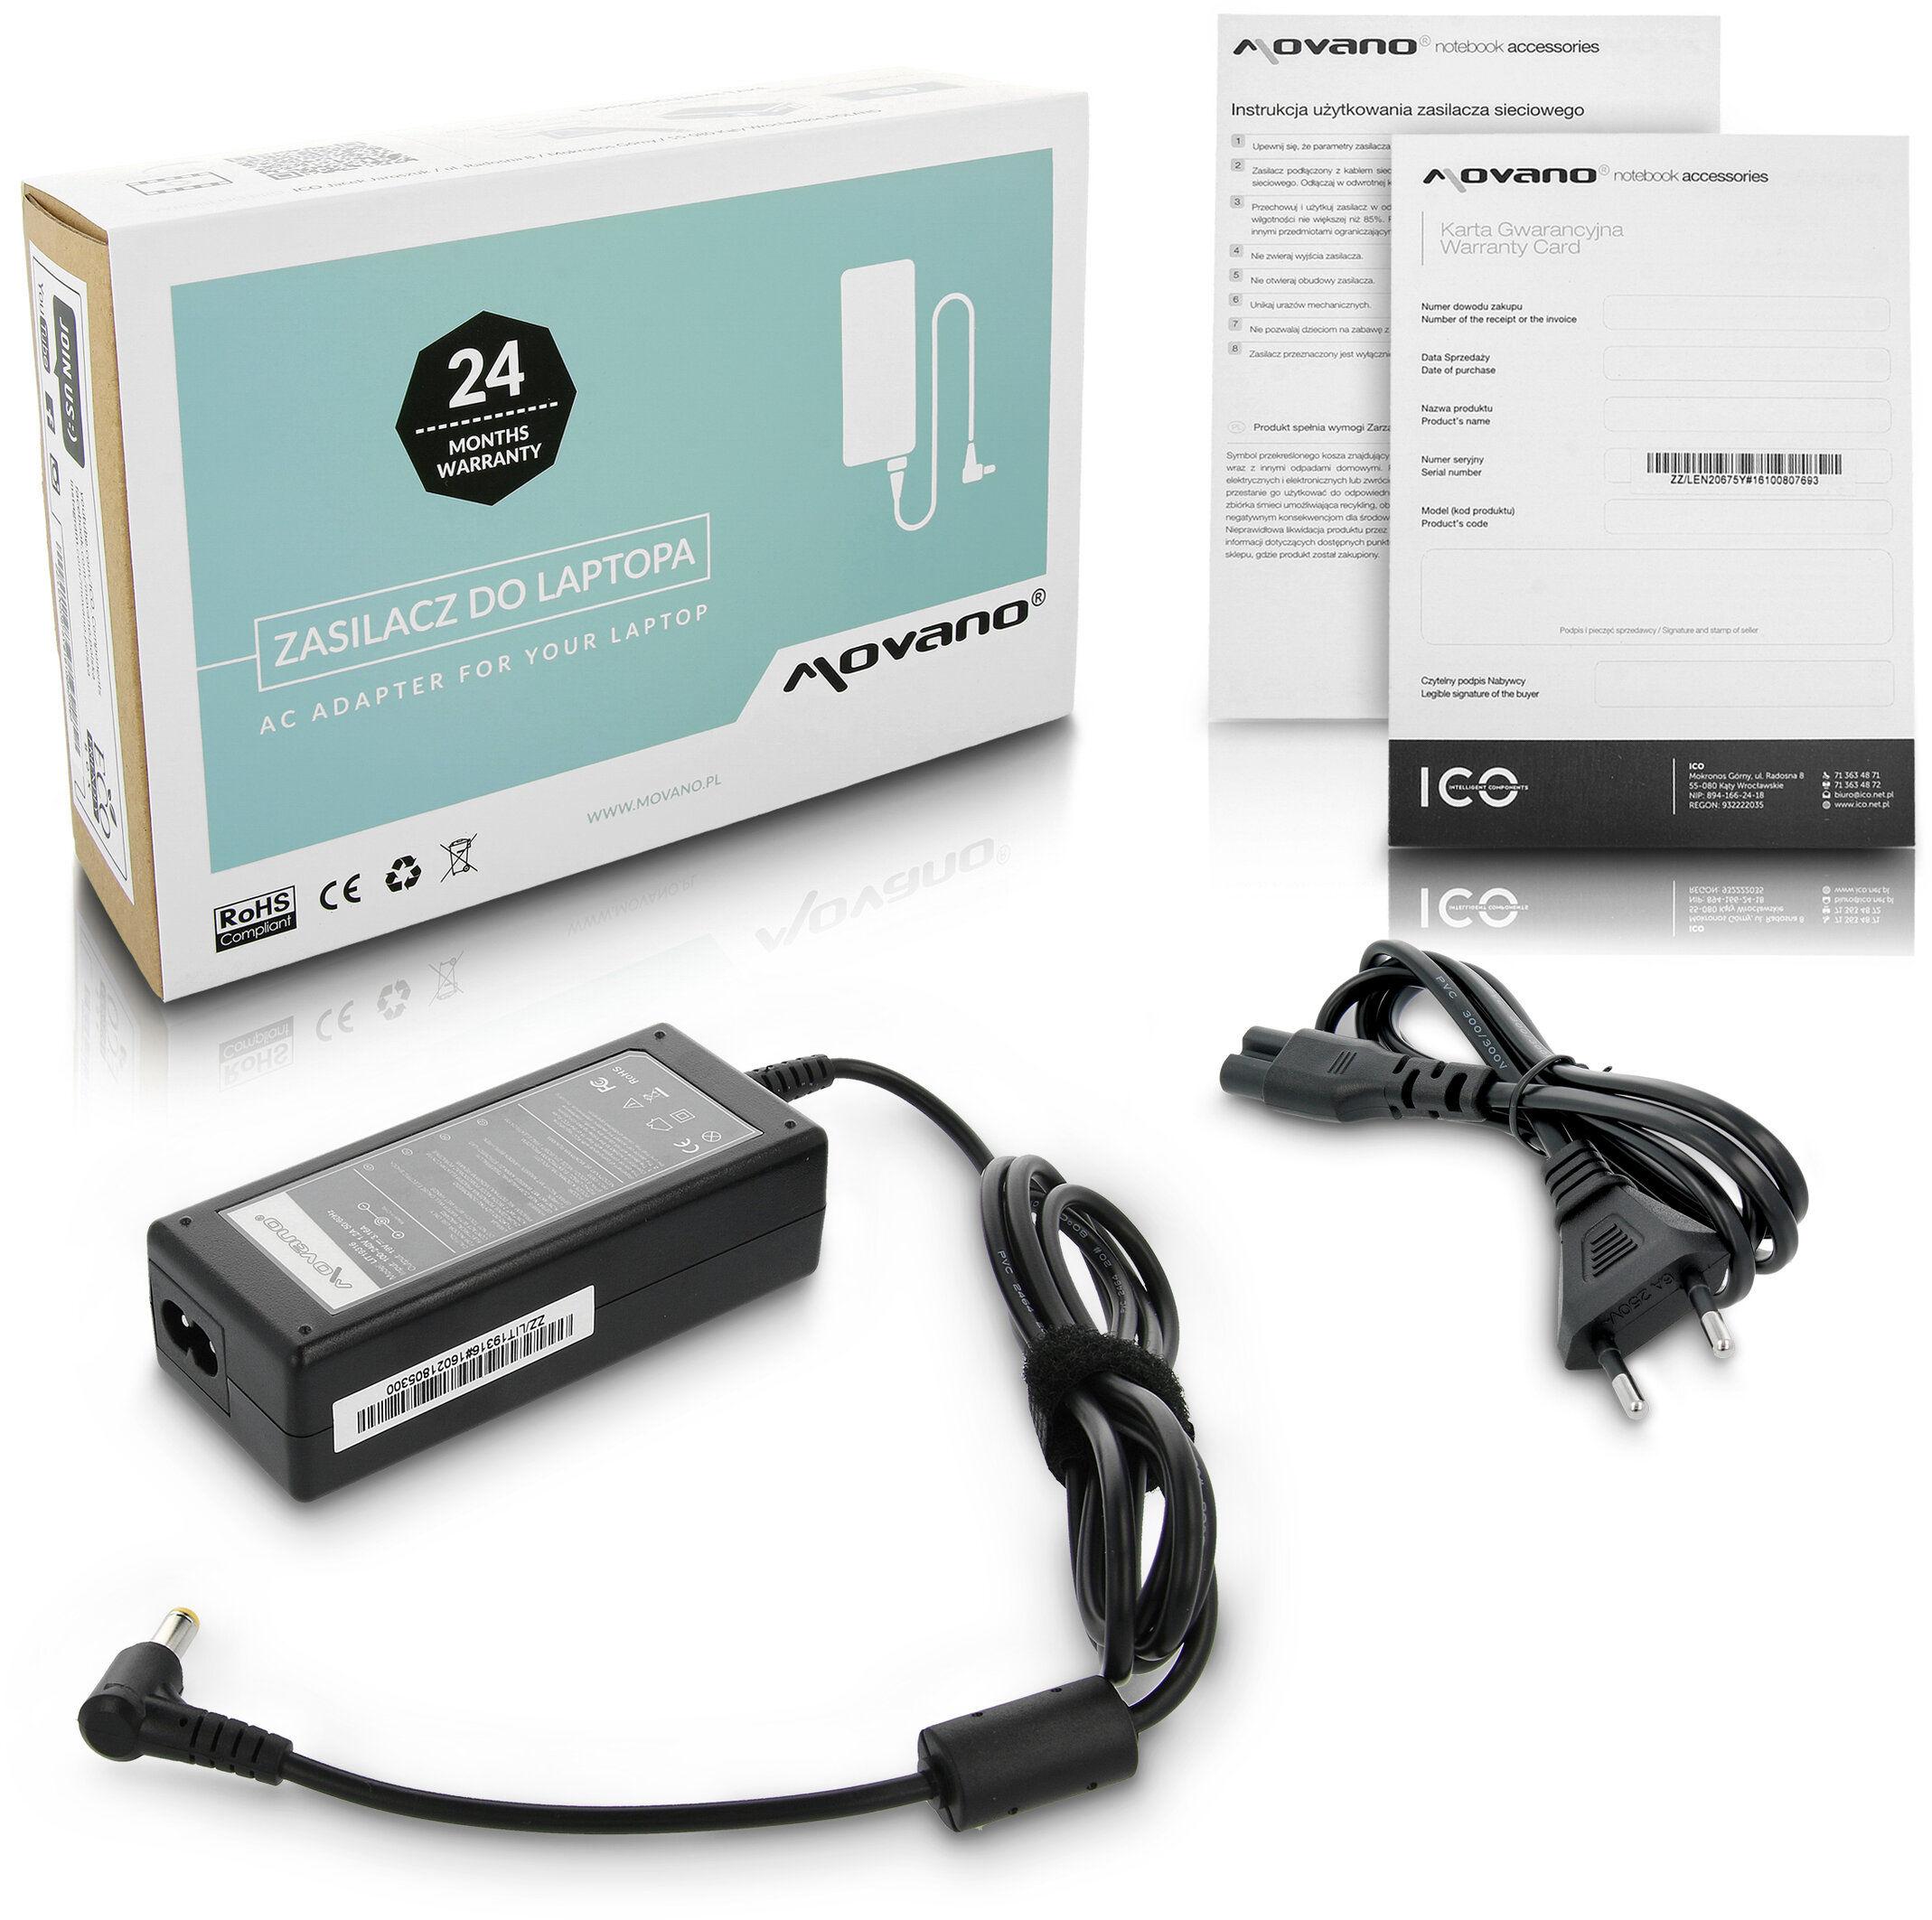 Zasilacz ładowarka do HP Omnibook 7103 7103t 7150 xe xe4100